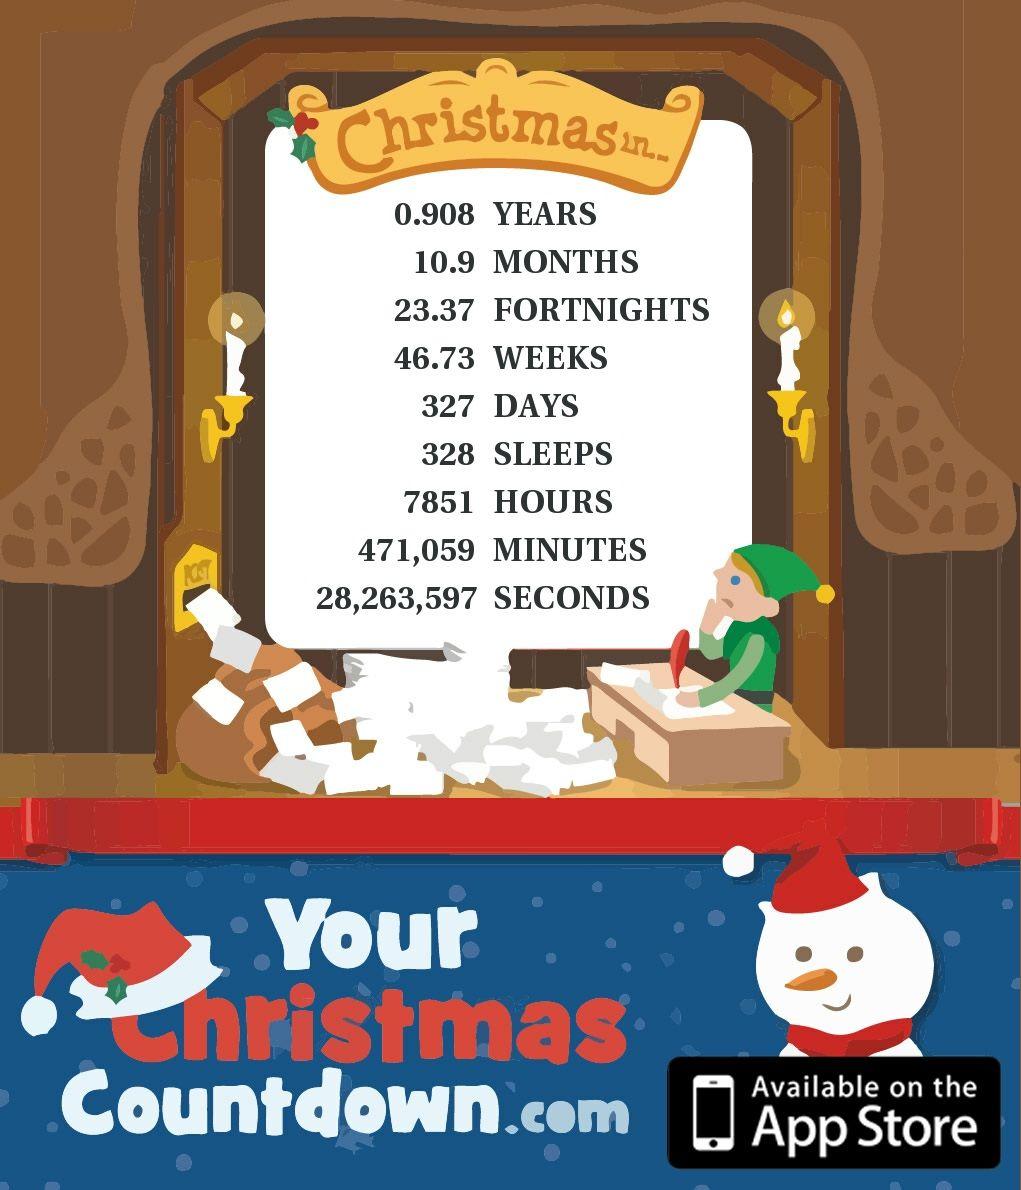 Only 327 Days 328 Sleeps Left Until Christmas Days Until Christmas Christmas Countdown Christmas